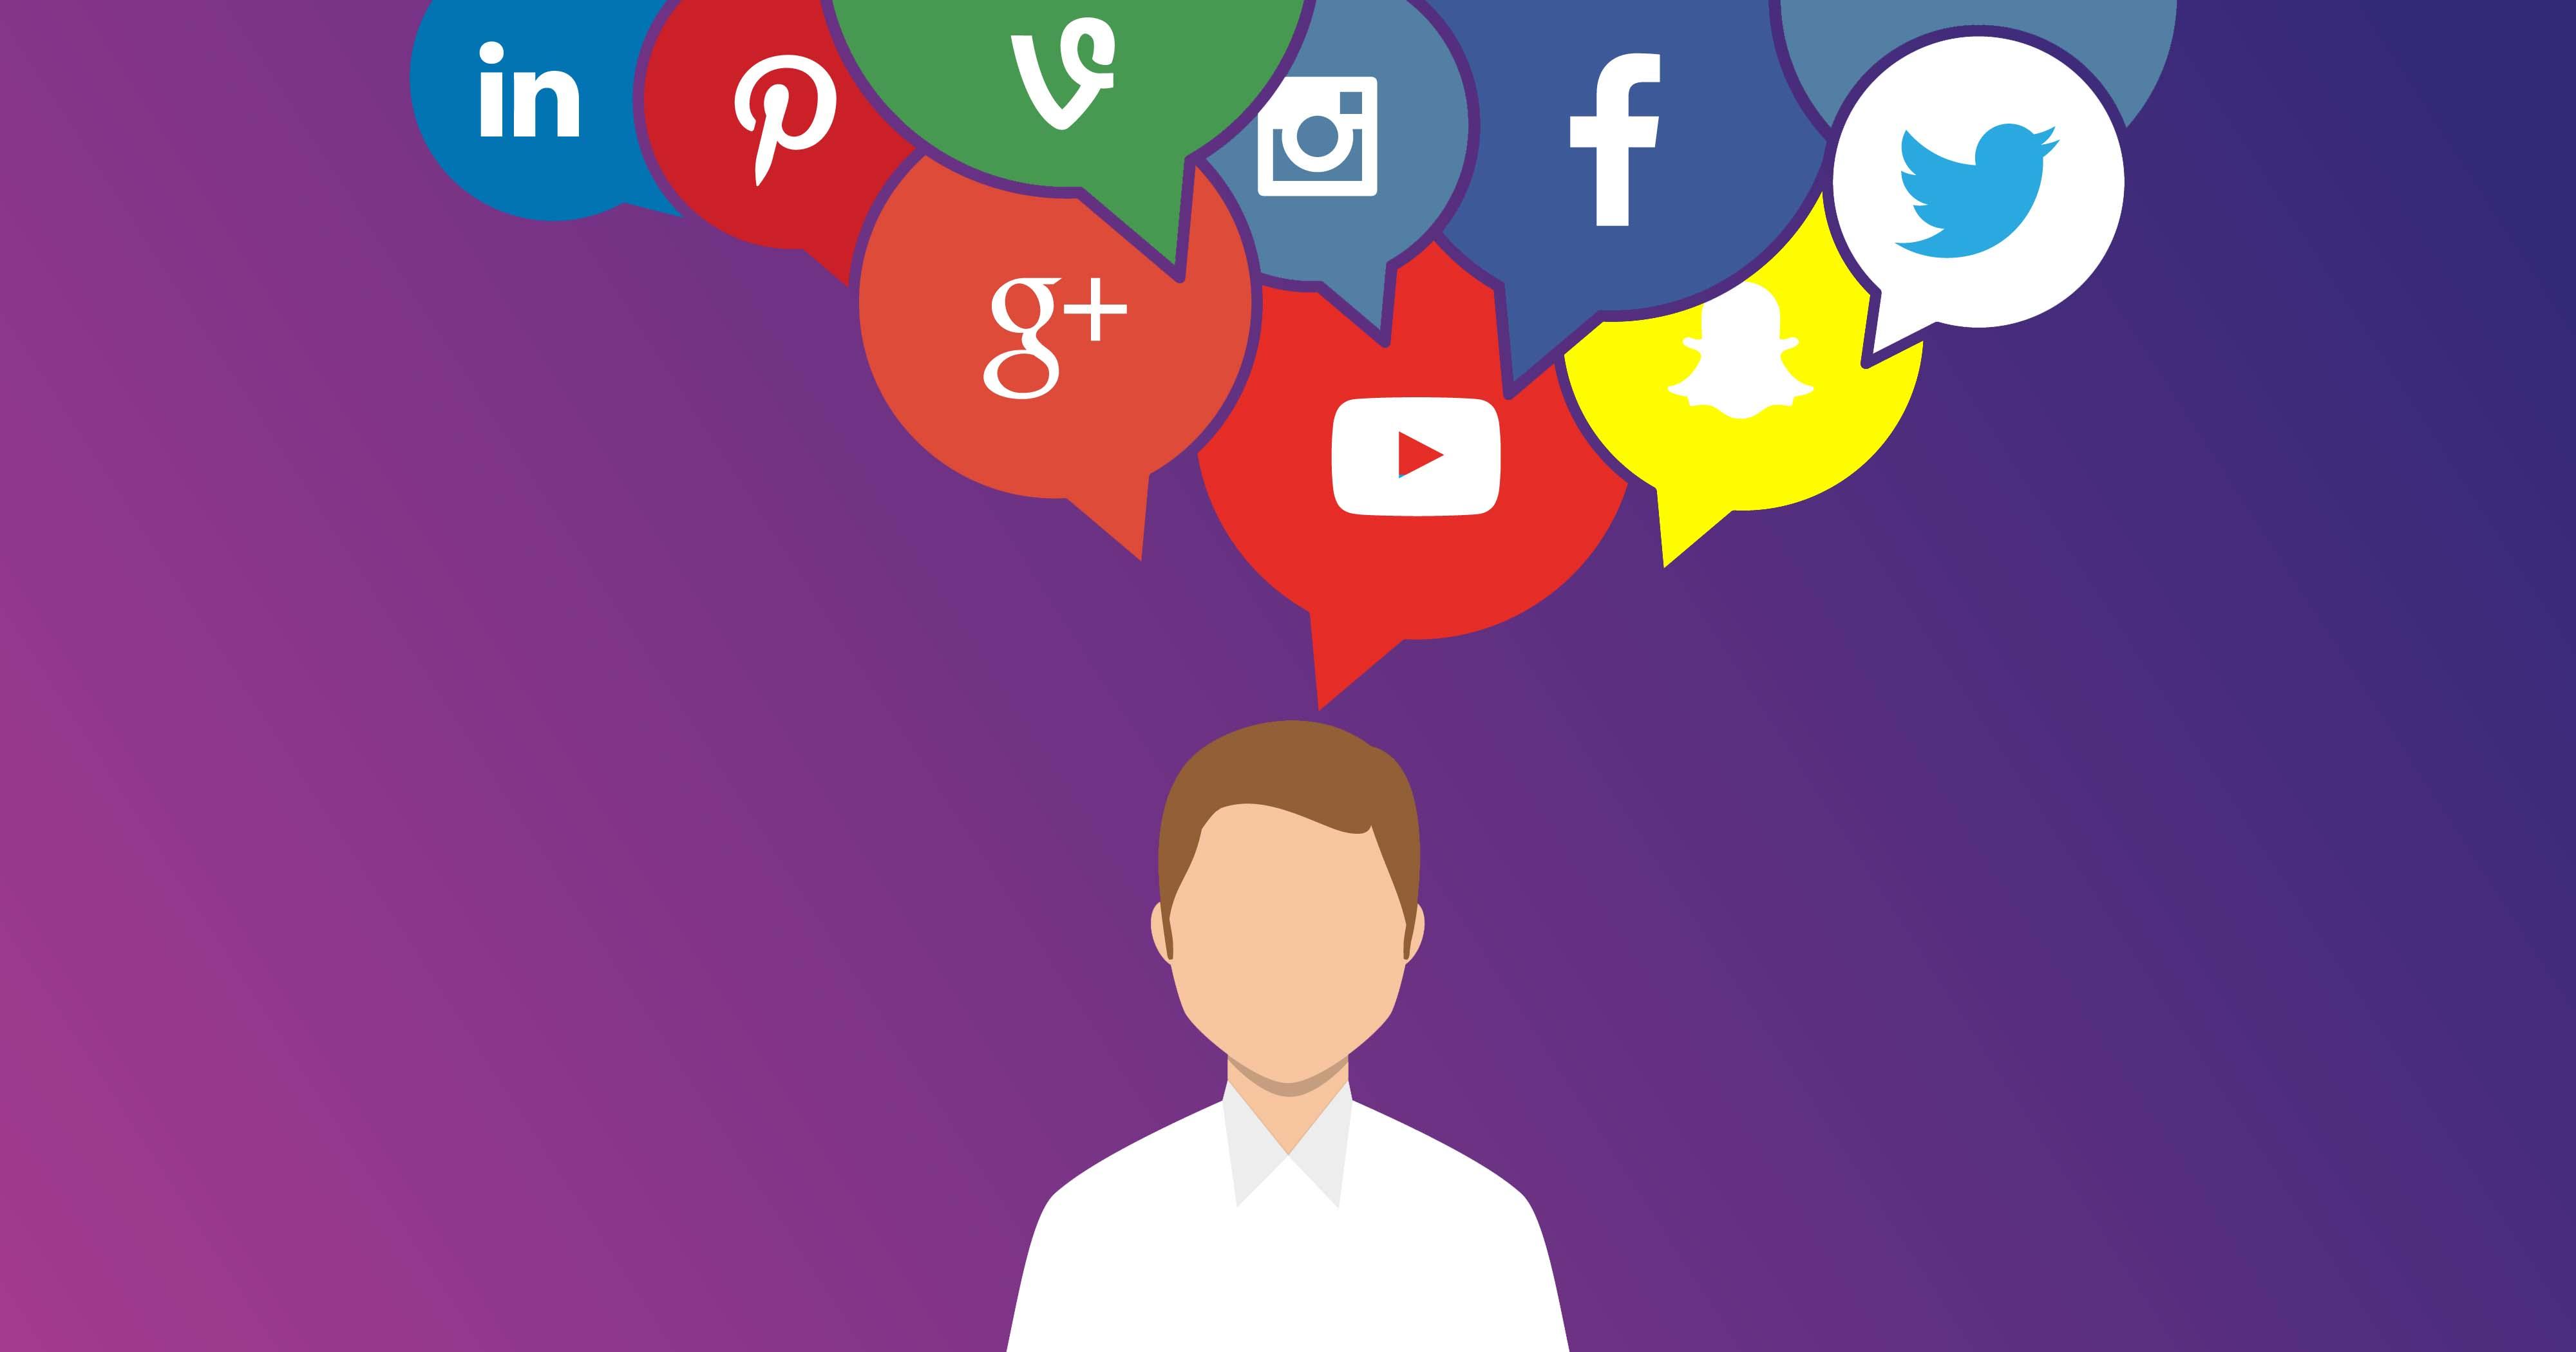 Week in social: le novità da Twitter, LinkedIn e Facebook